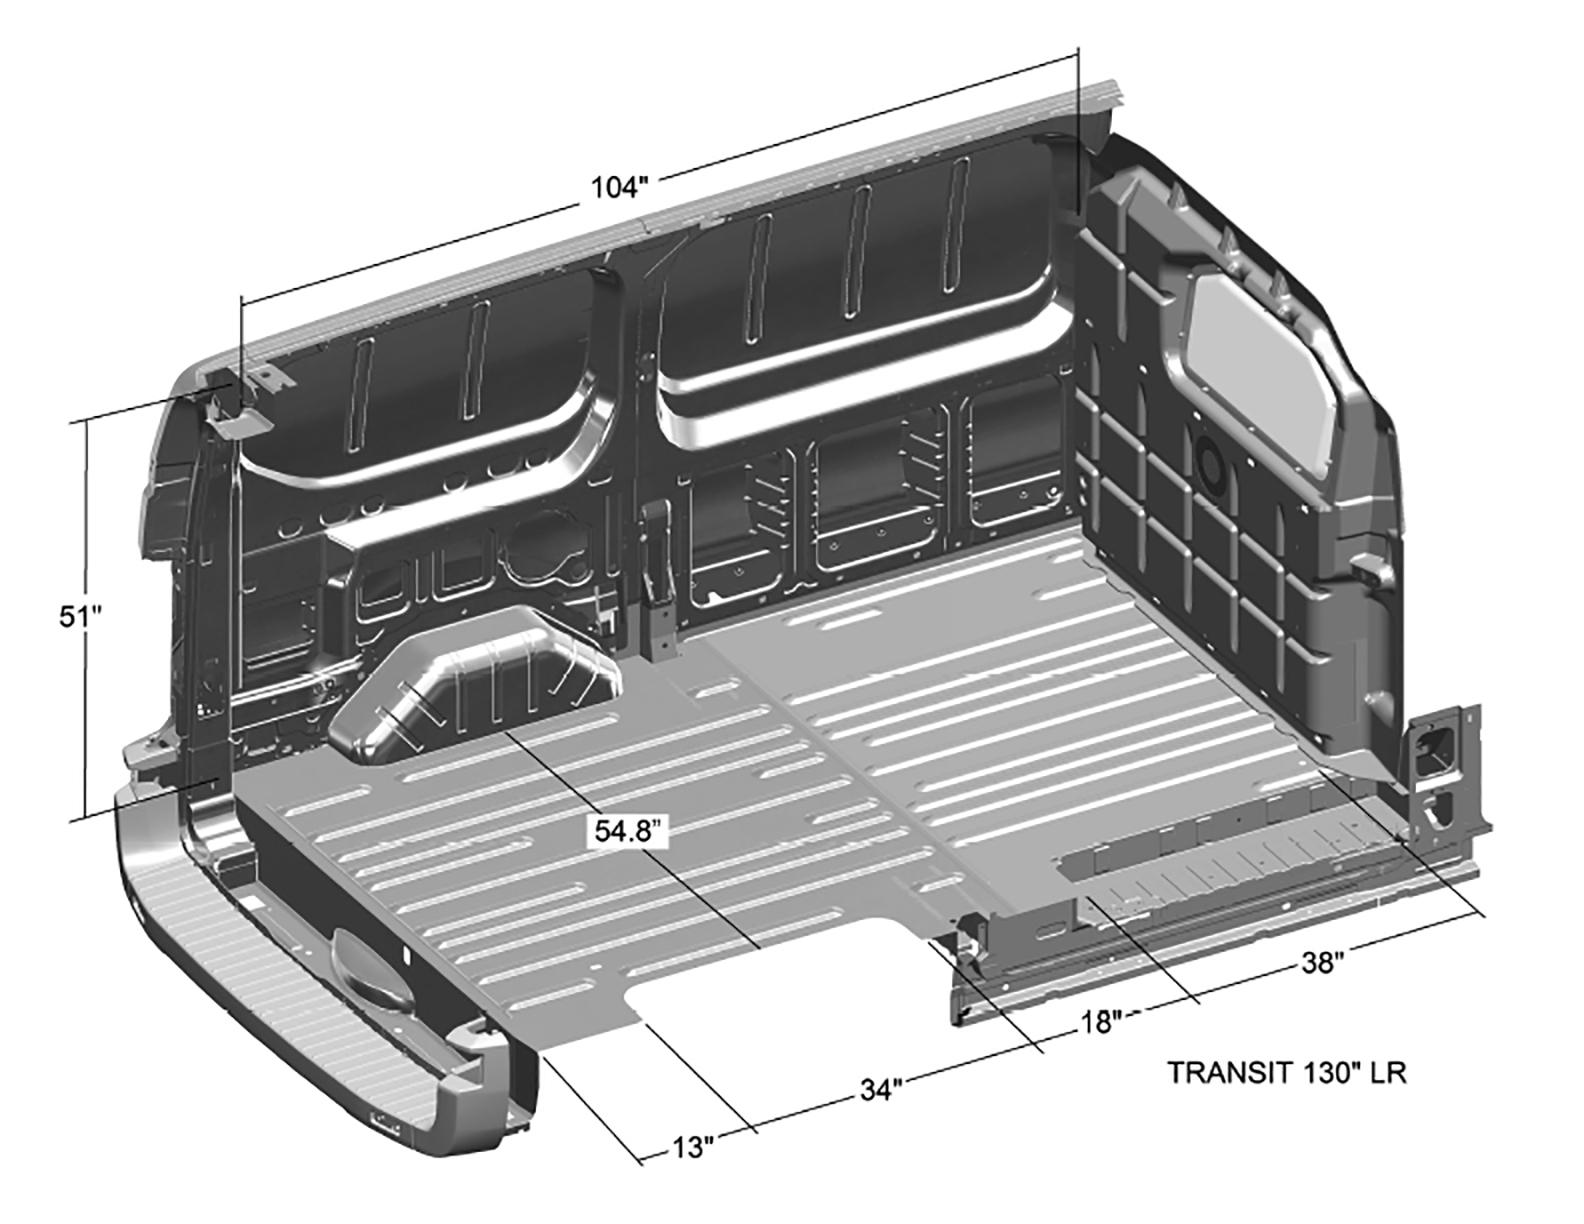 transit-130-lr-w-dims-large.jpg